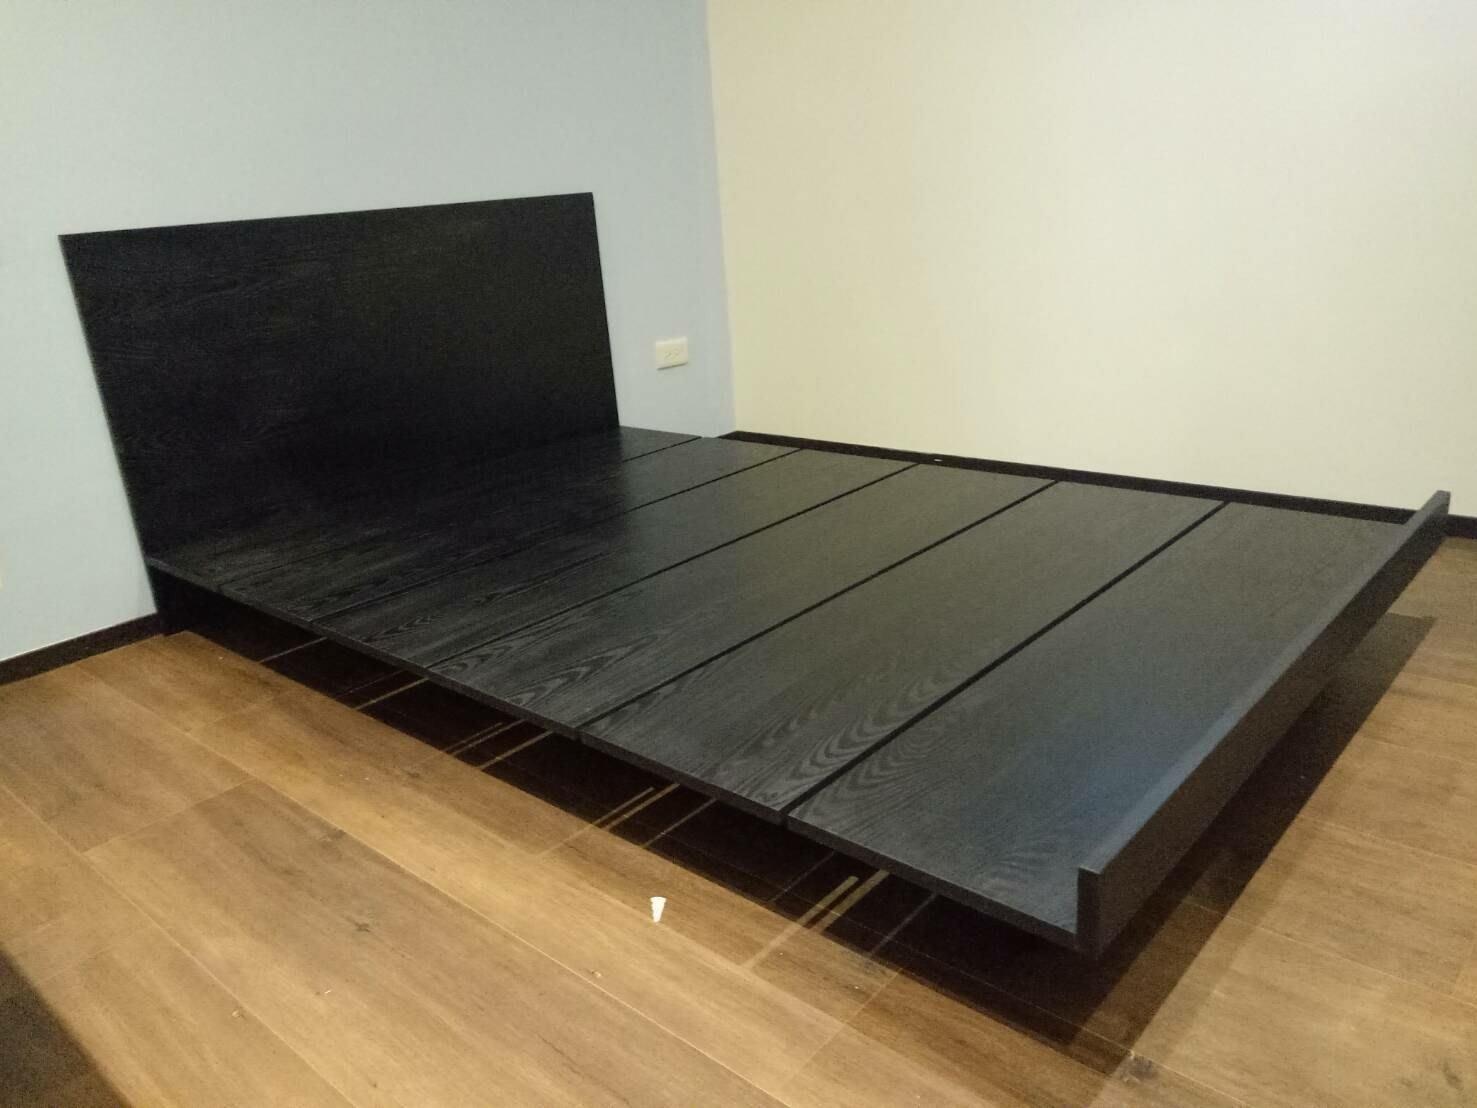 HODERN 工業風&北歐風床組新選擇,鐵道床/棧板床,使用實木貼皮板染色,兼顧設計感&價格實惠,高CP值請鑑賞~